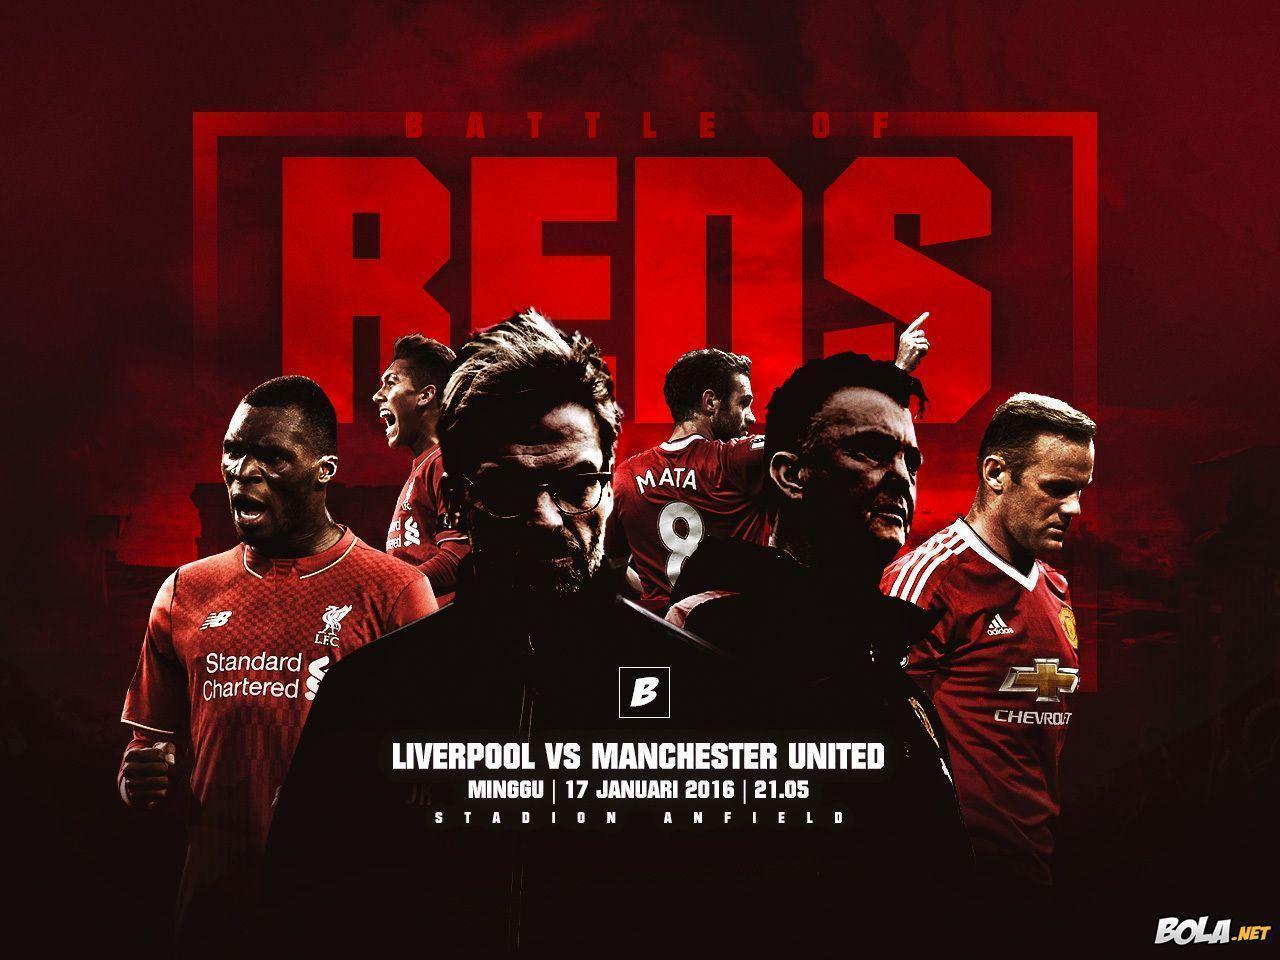 100 ] Liverpool Wallpaper 2017 On WallpaperSafari